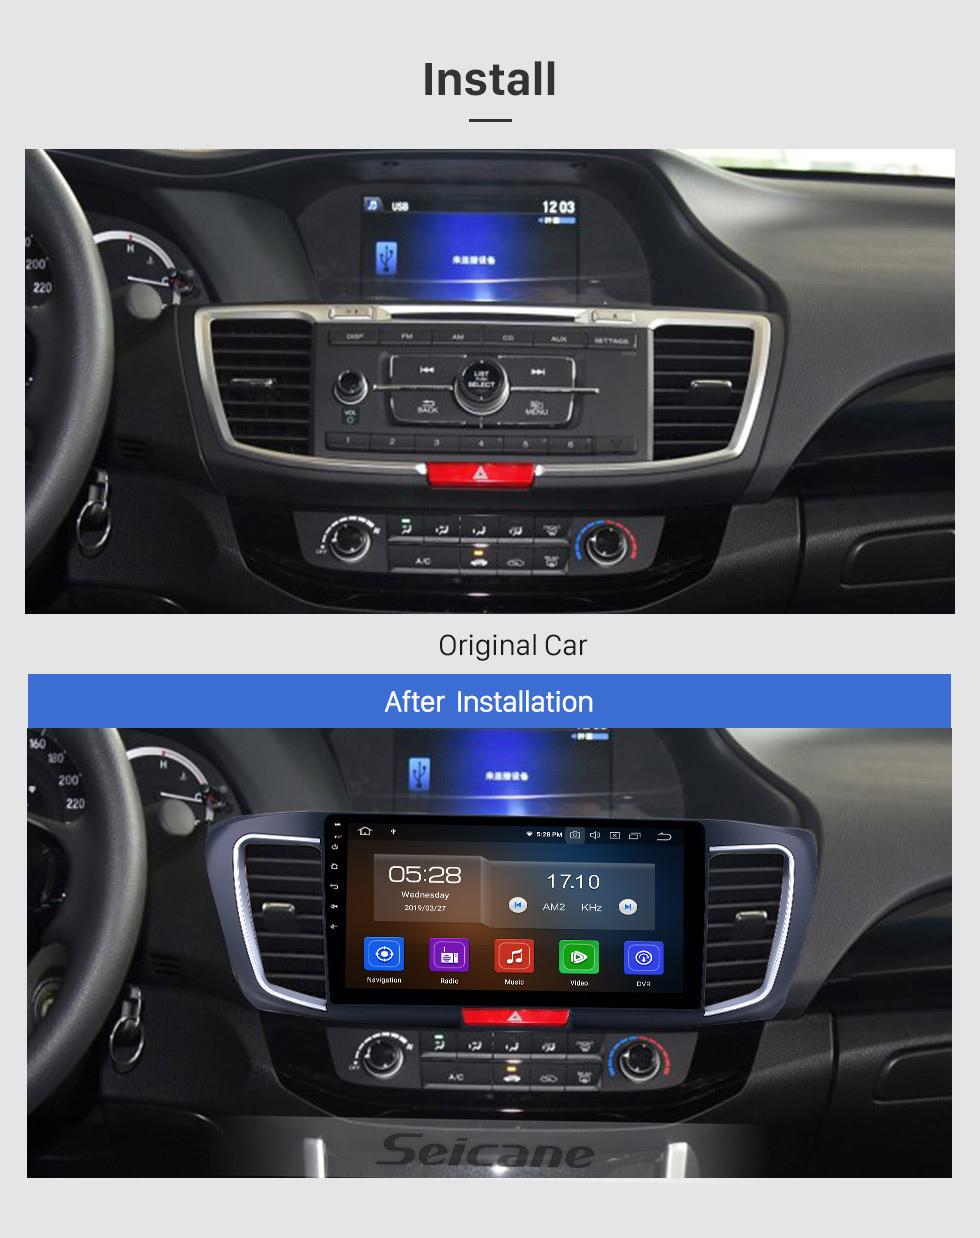 Seicane 10,1 pouces 2013 Honda Accord 9 Version High Android 9.0 Radio de navigation GPS Bluetooth HD Écran tactile Soutien Carplay Miroir Lien